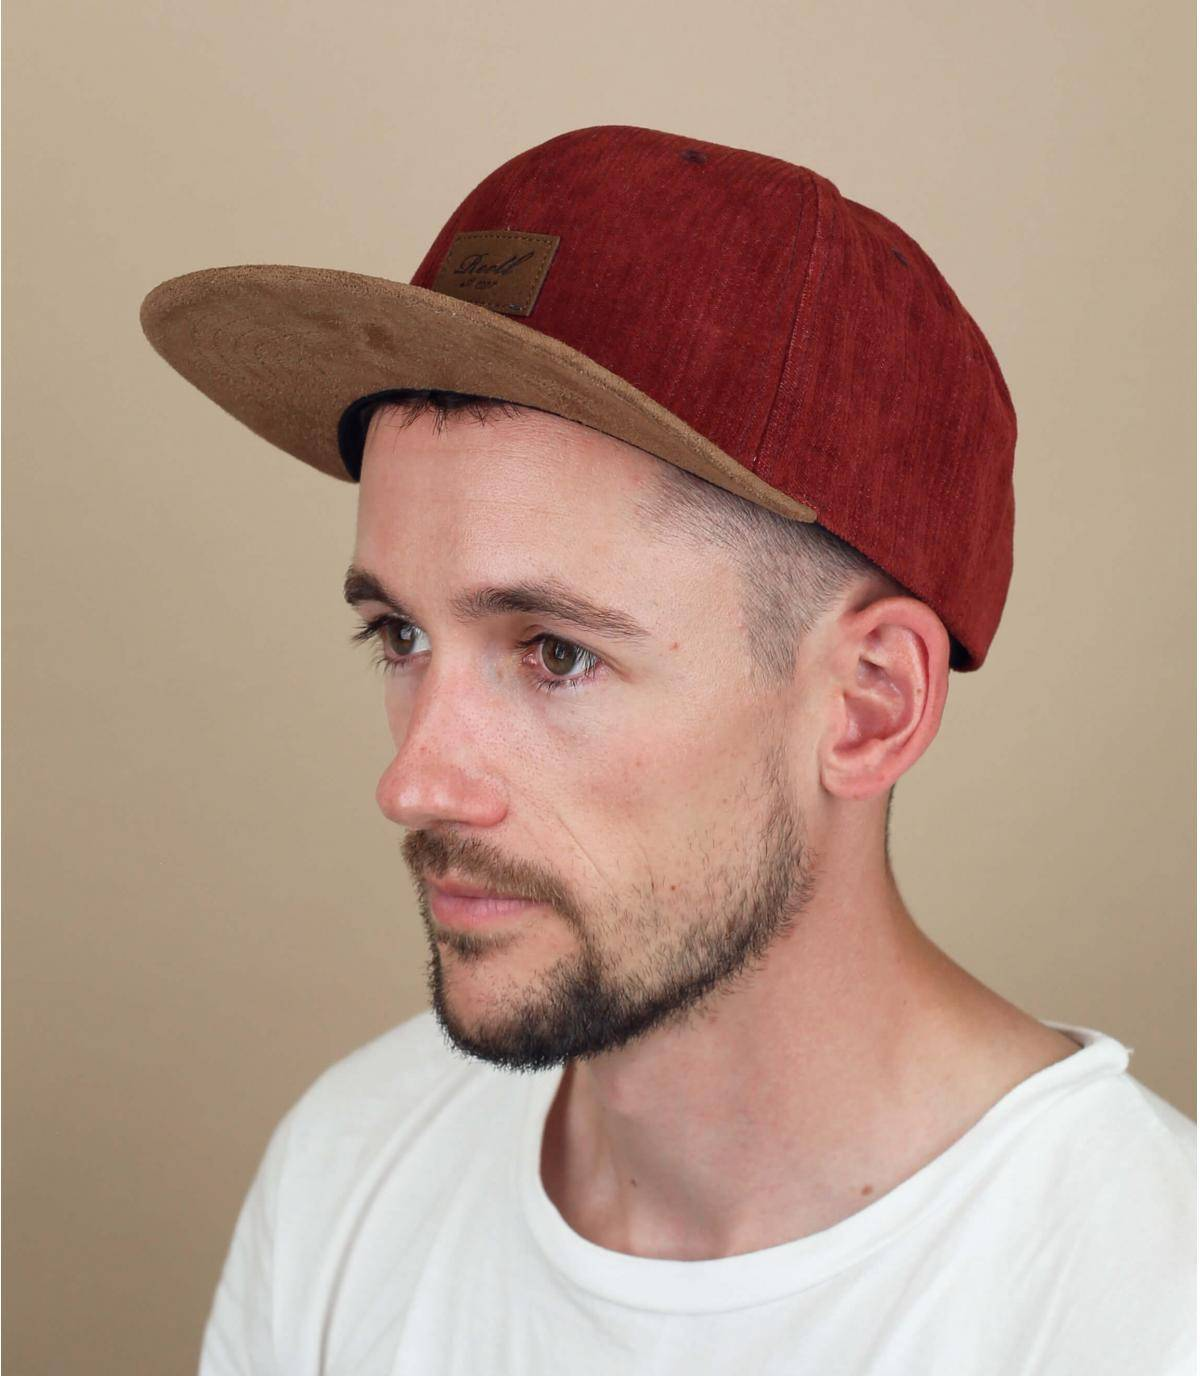 cappellino bordeaux Reell